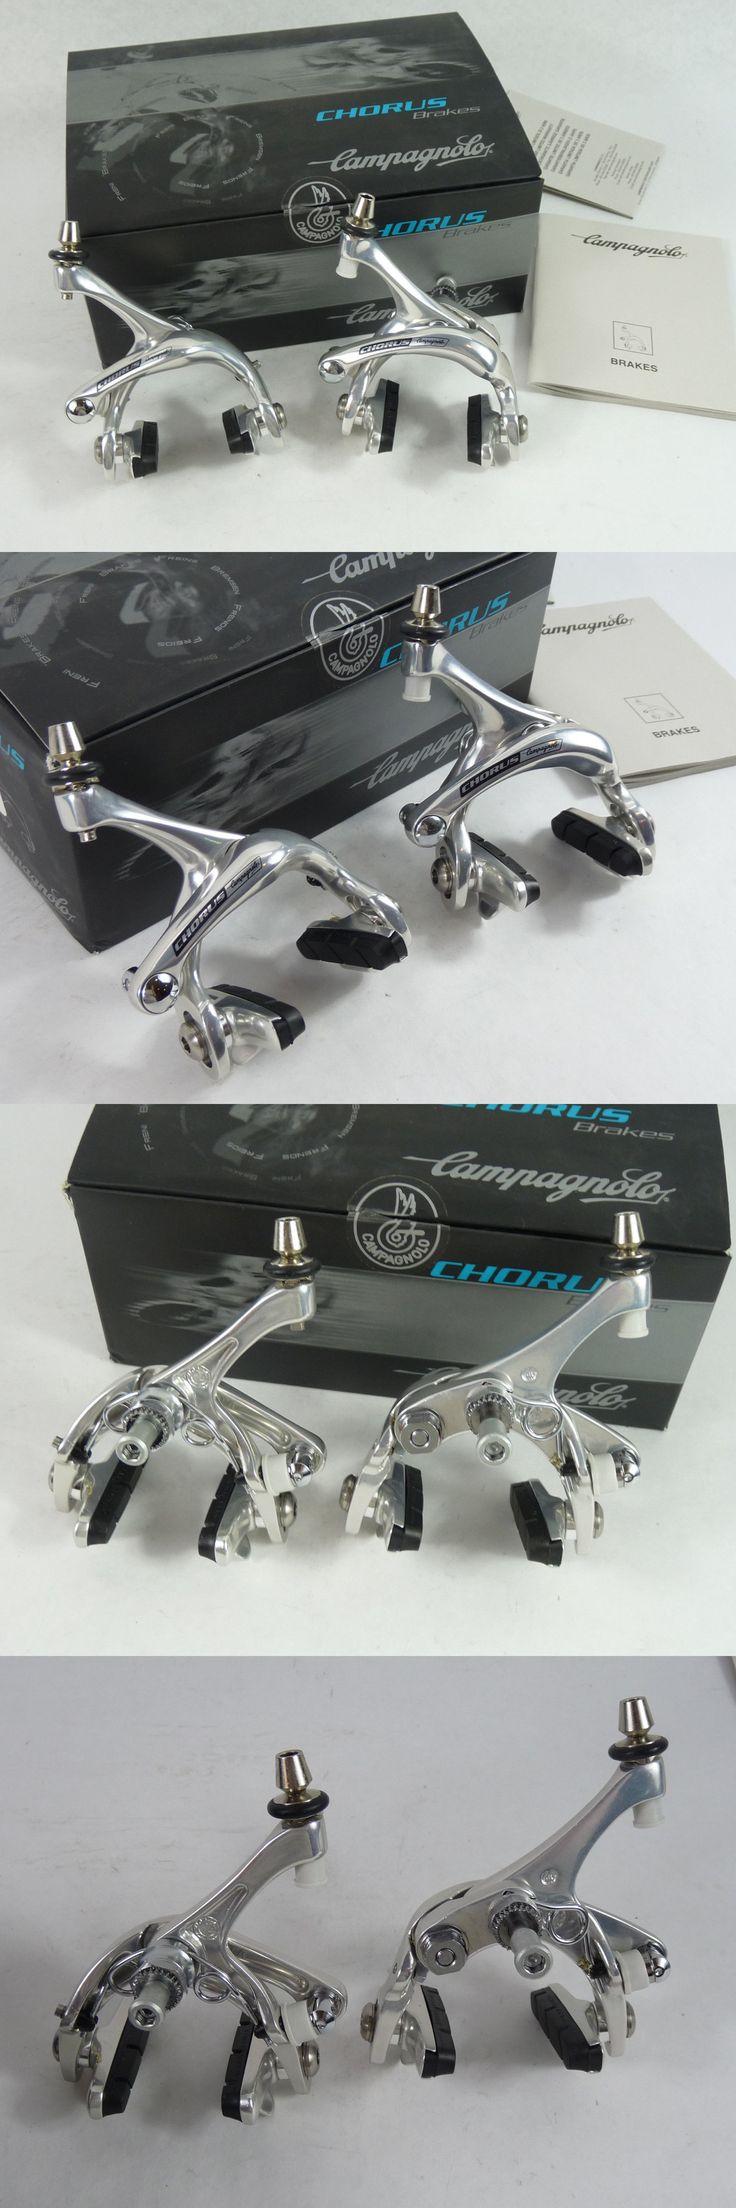 Vintage Bicycle Parts 56197: Campagnolo Chorus 10 Speed Brakeset Dual Pivot Brakes Record Set Nos BUY IT NOW ONLY: $139.99